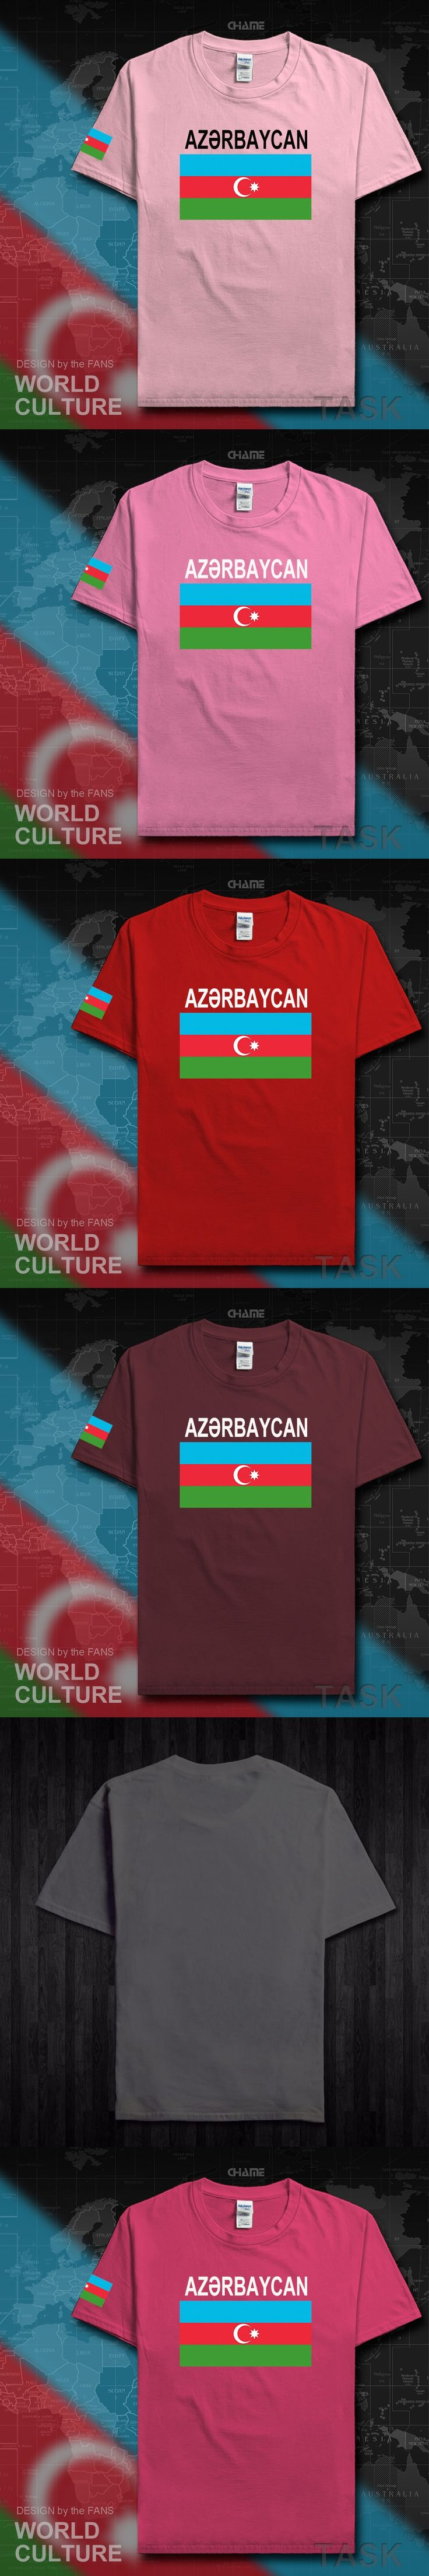 Azerbaijan Azerbaijani men t shirts 2017 jerseys nation team tshirt 100% cotton t-shirt clothing tees country sporting flags AZE